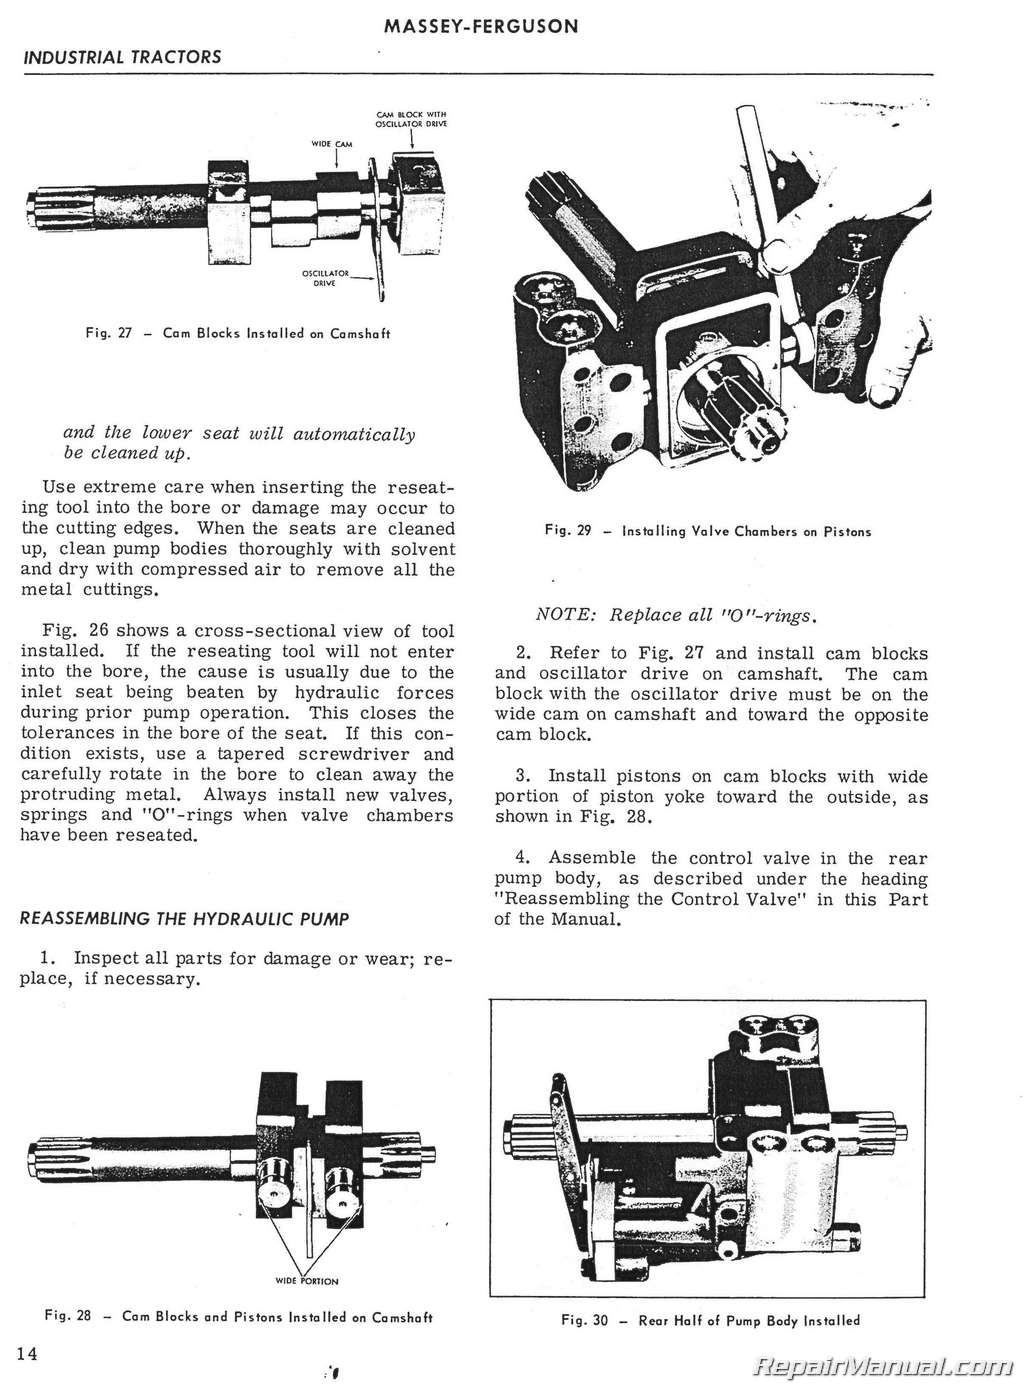 kenmore he2 plus washer parts diagram goodman furnace ford 6640 tractor imageresizertool com